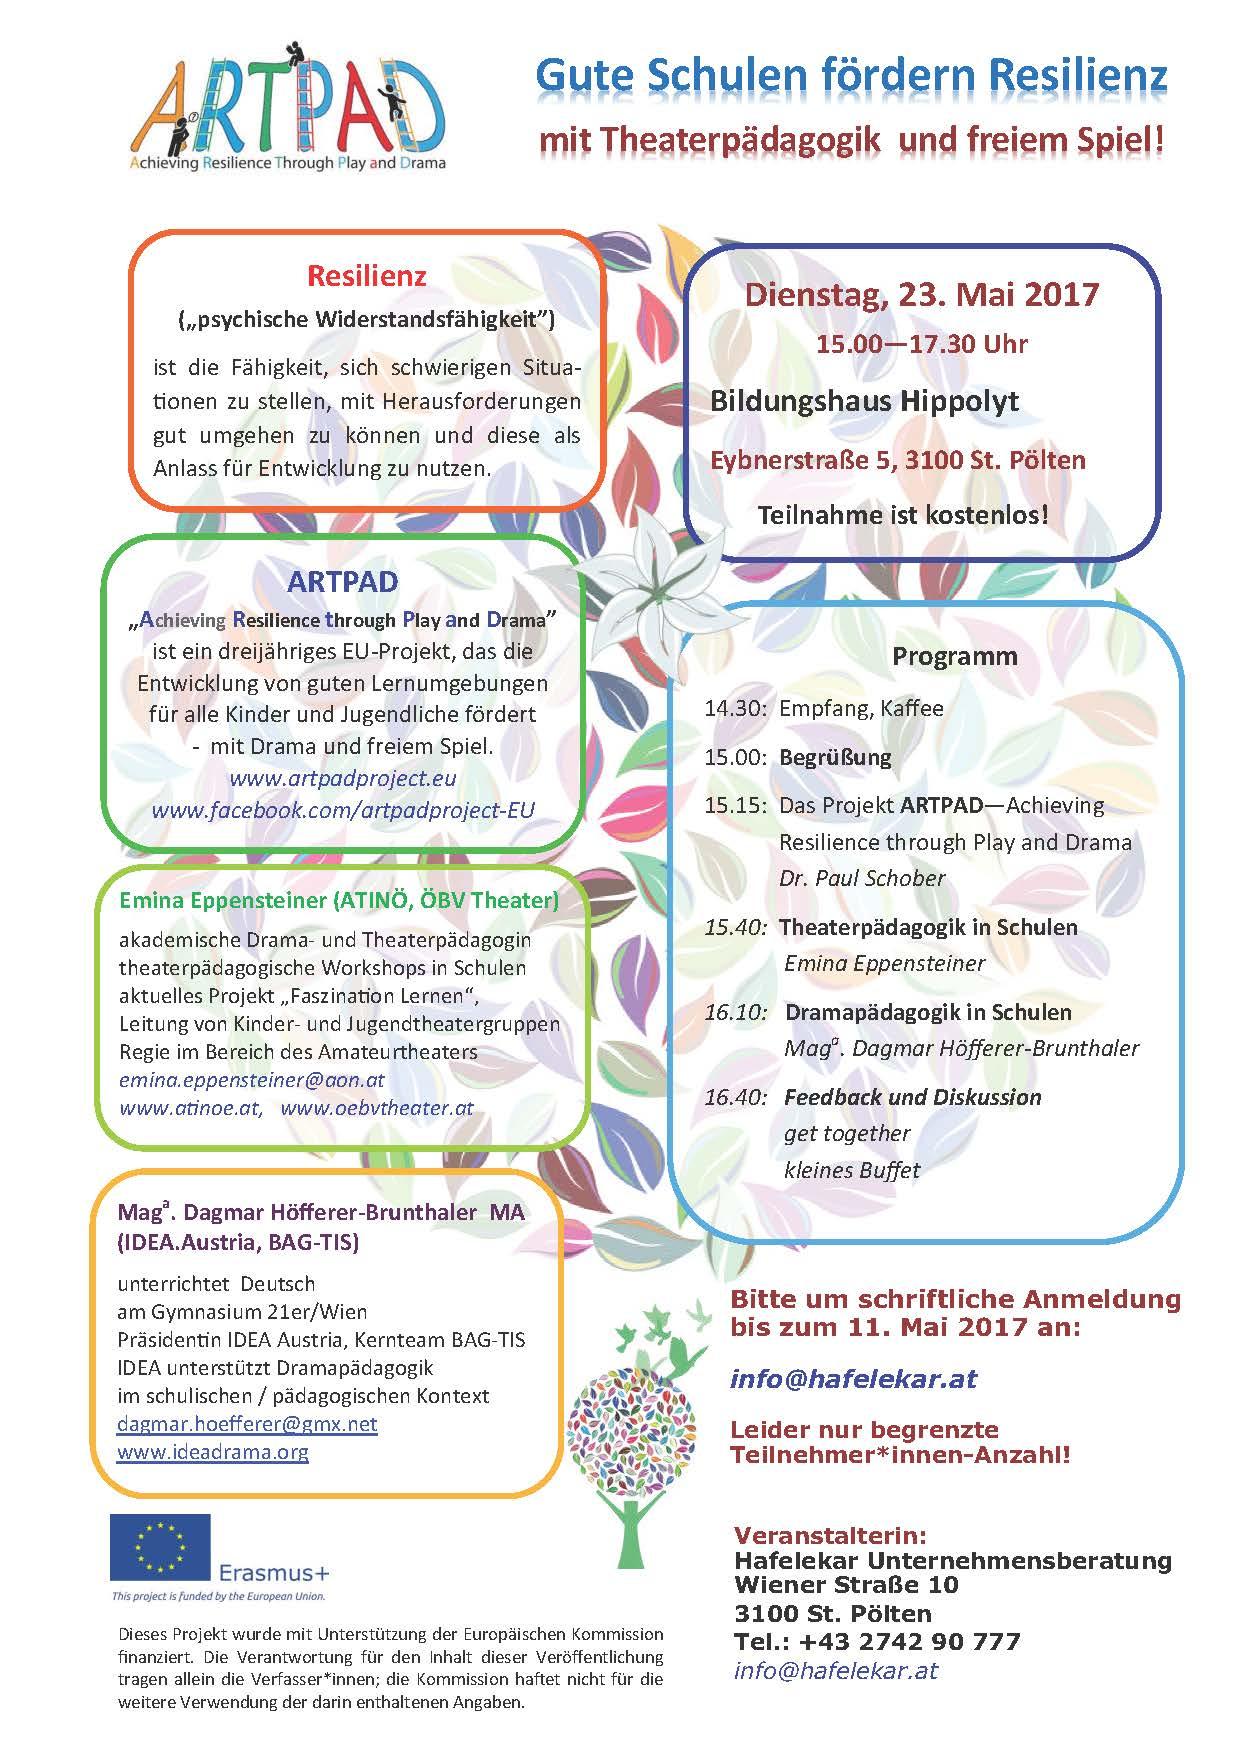 Einladung_Artpad_23.05.2017